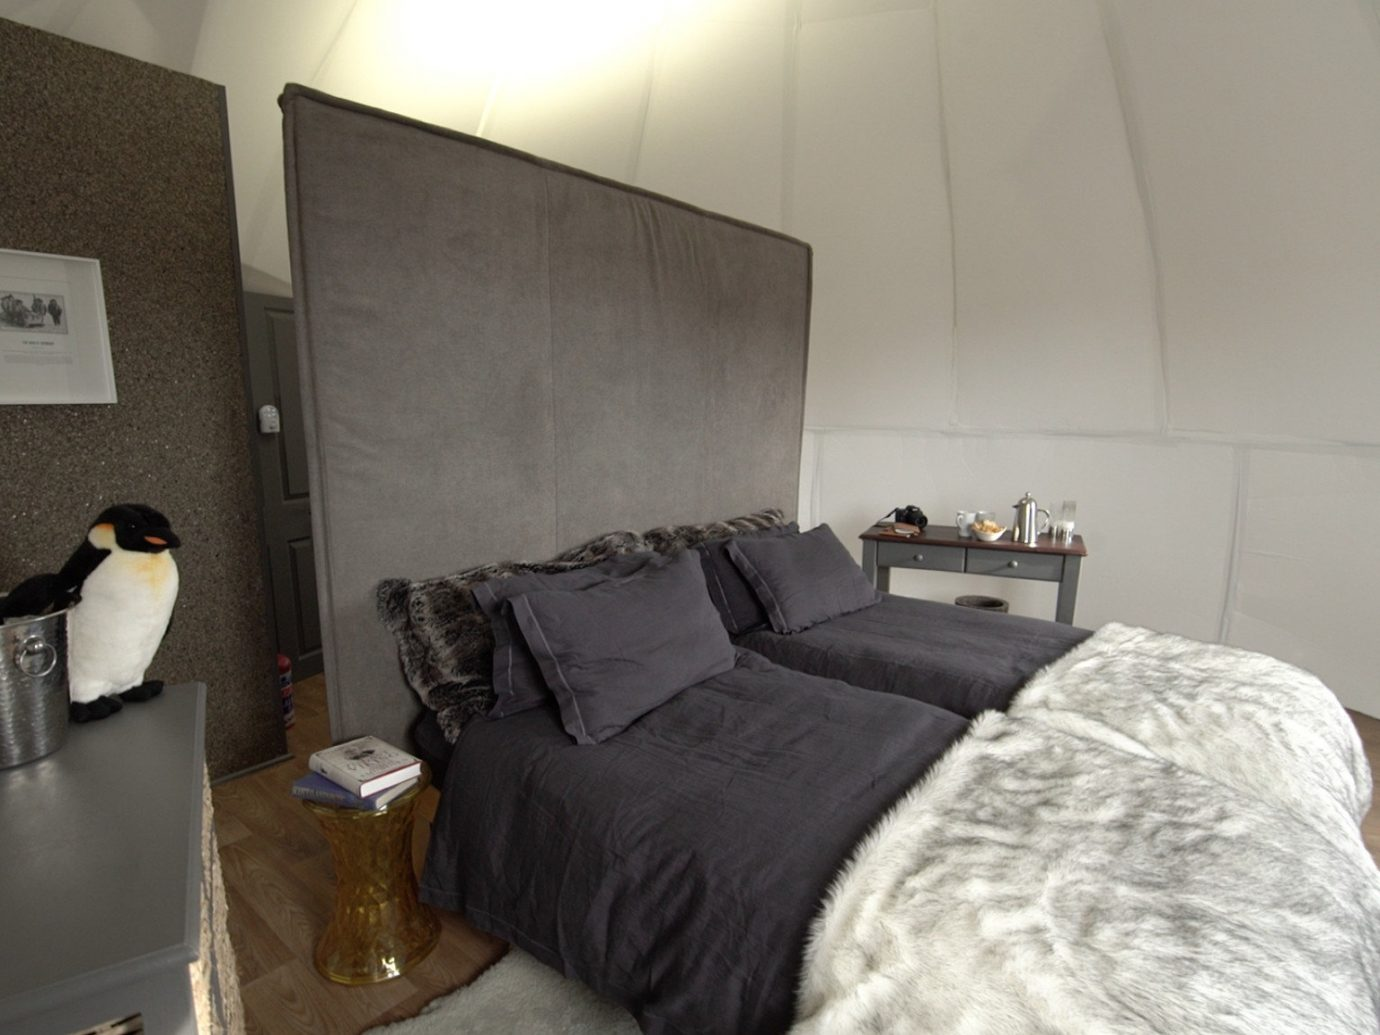 Luxury Travel Trip Ideas indoor wall room property Bedroom interior design home floor bed frame loft ceiling house furniture